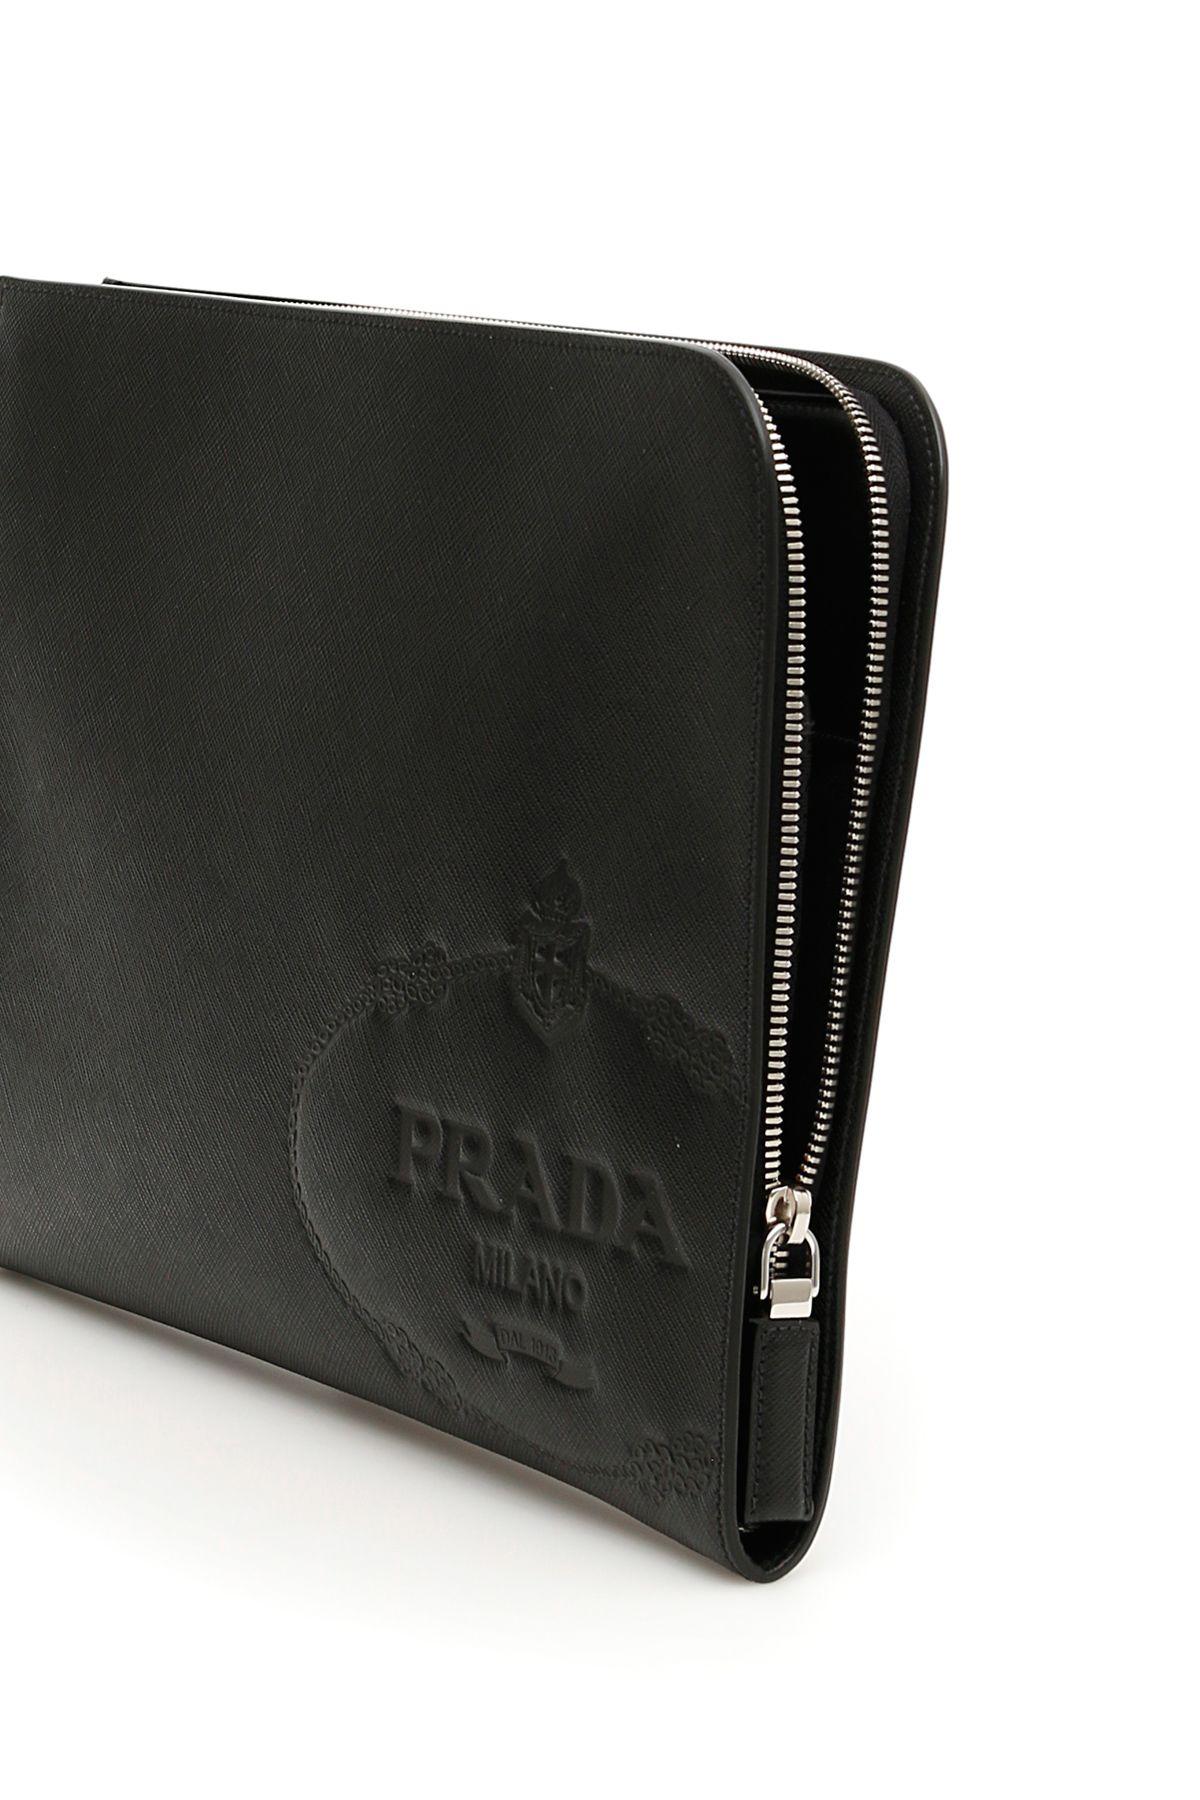 bc83505c18a5 Prada Prada Saffiano Document Holder - NERO (Black) - 10903418 | italist